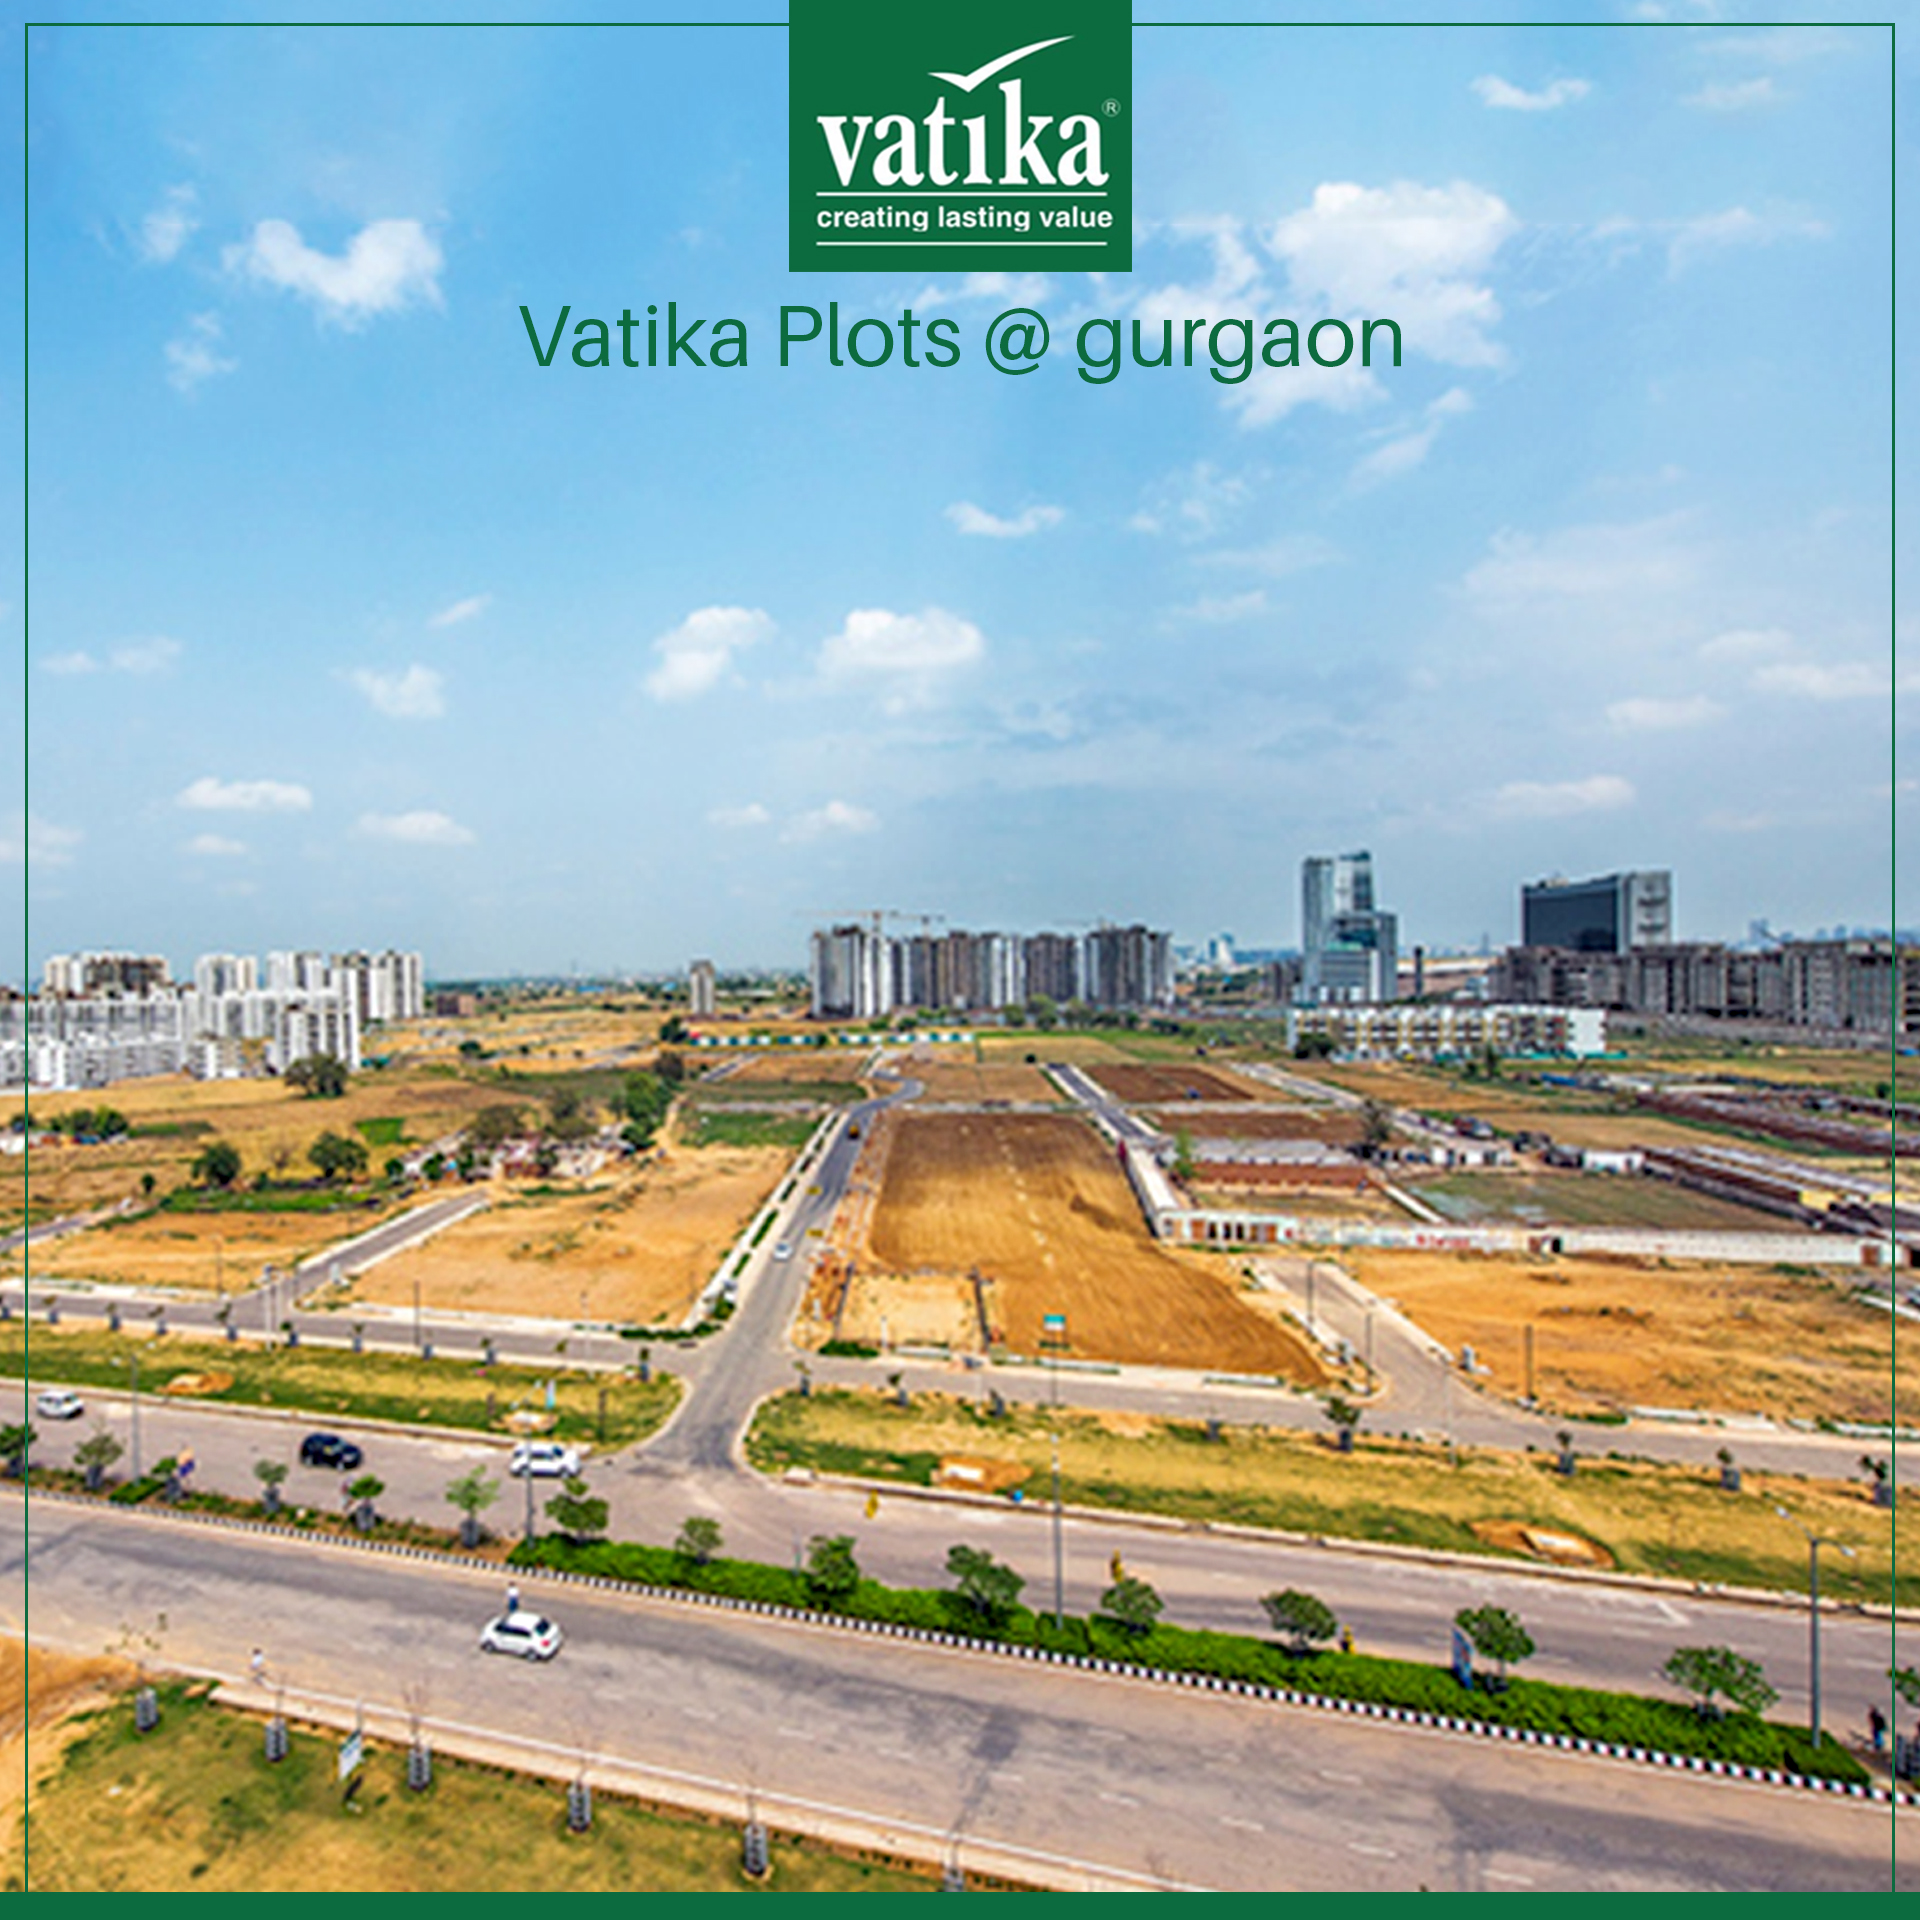 Vatika Plots in Gurgaon